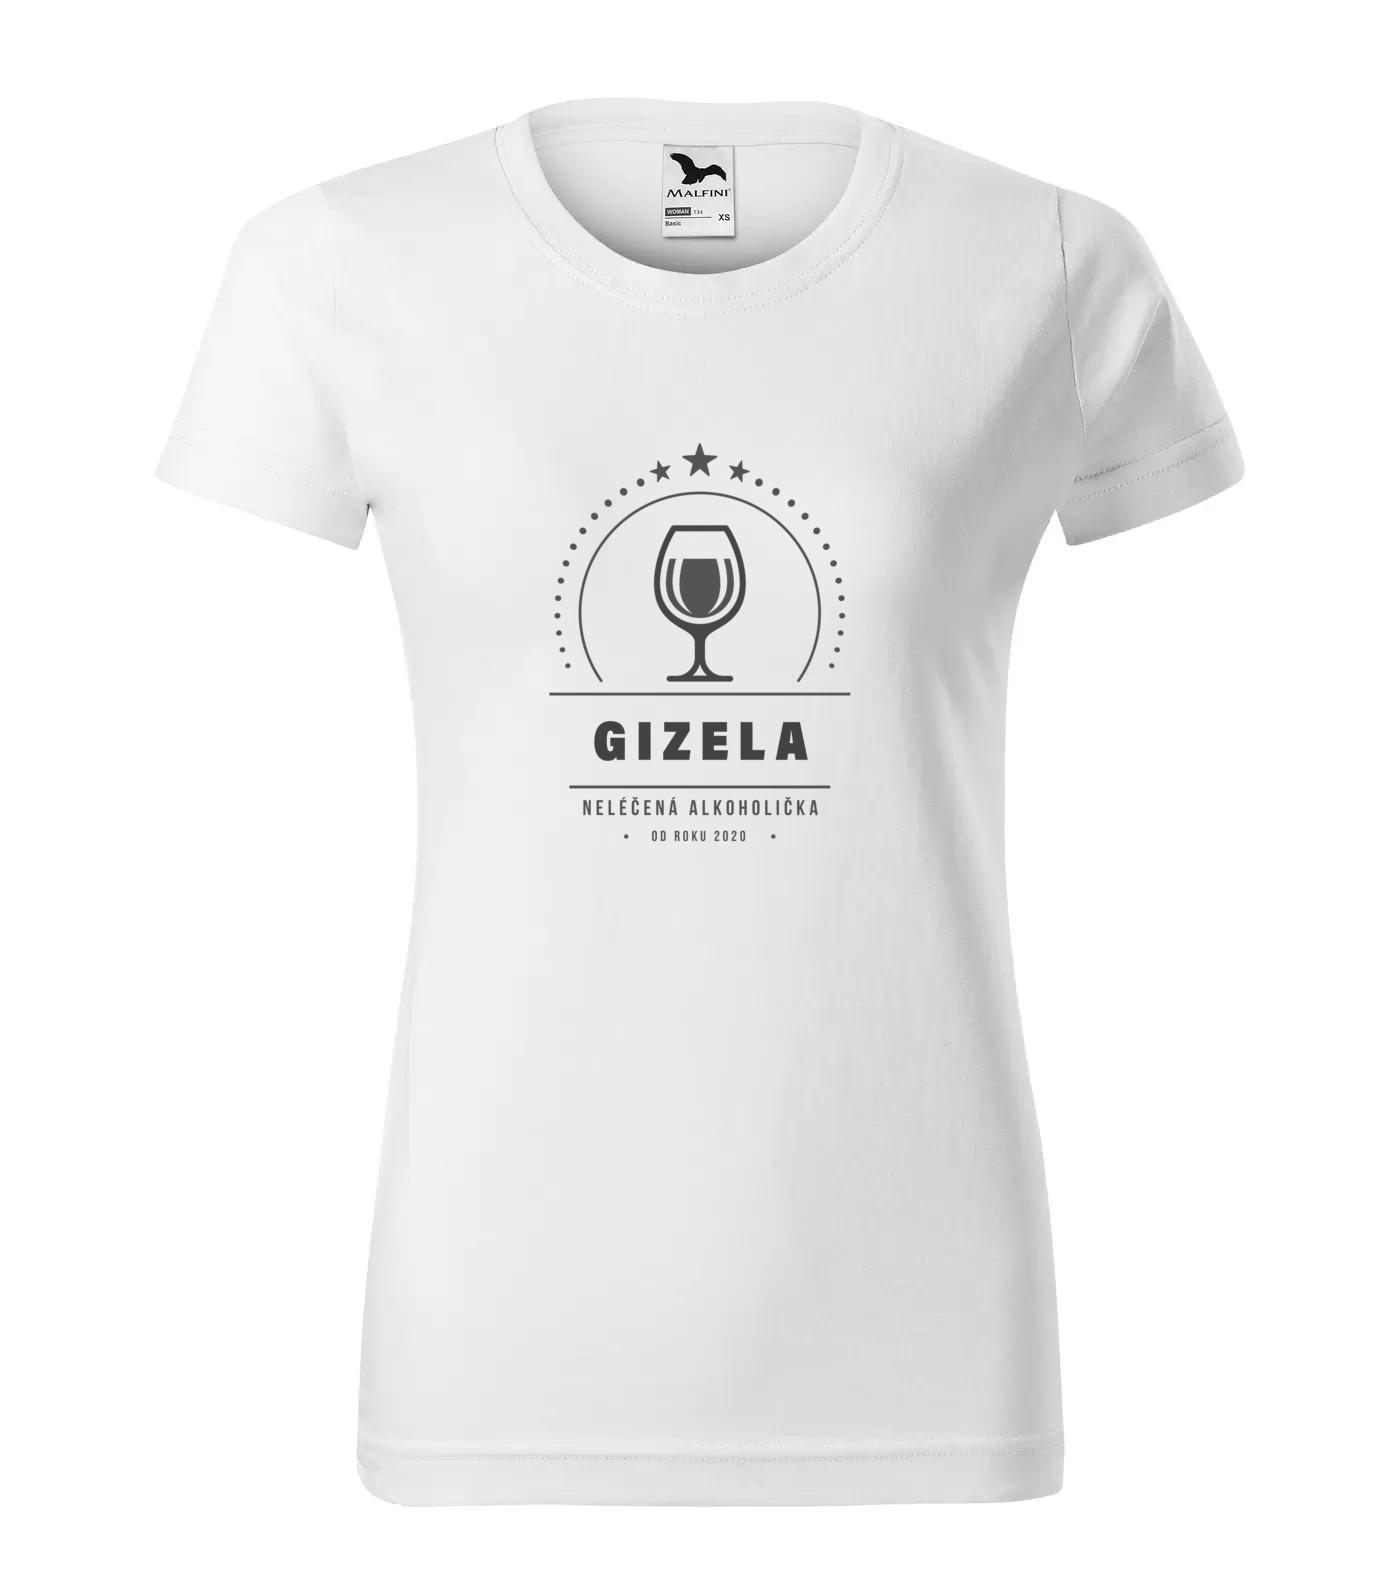 Tričko Alkoholička Gizela